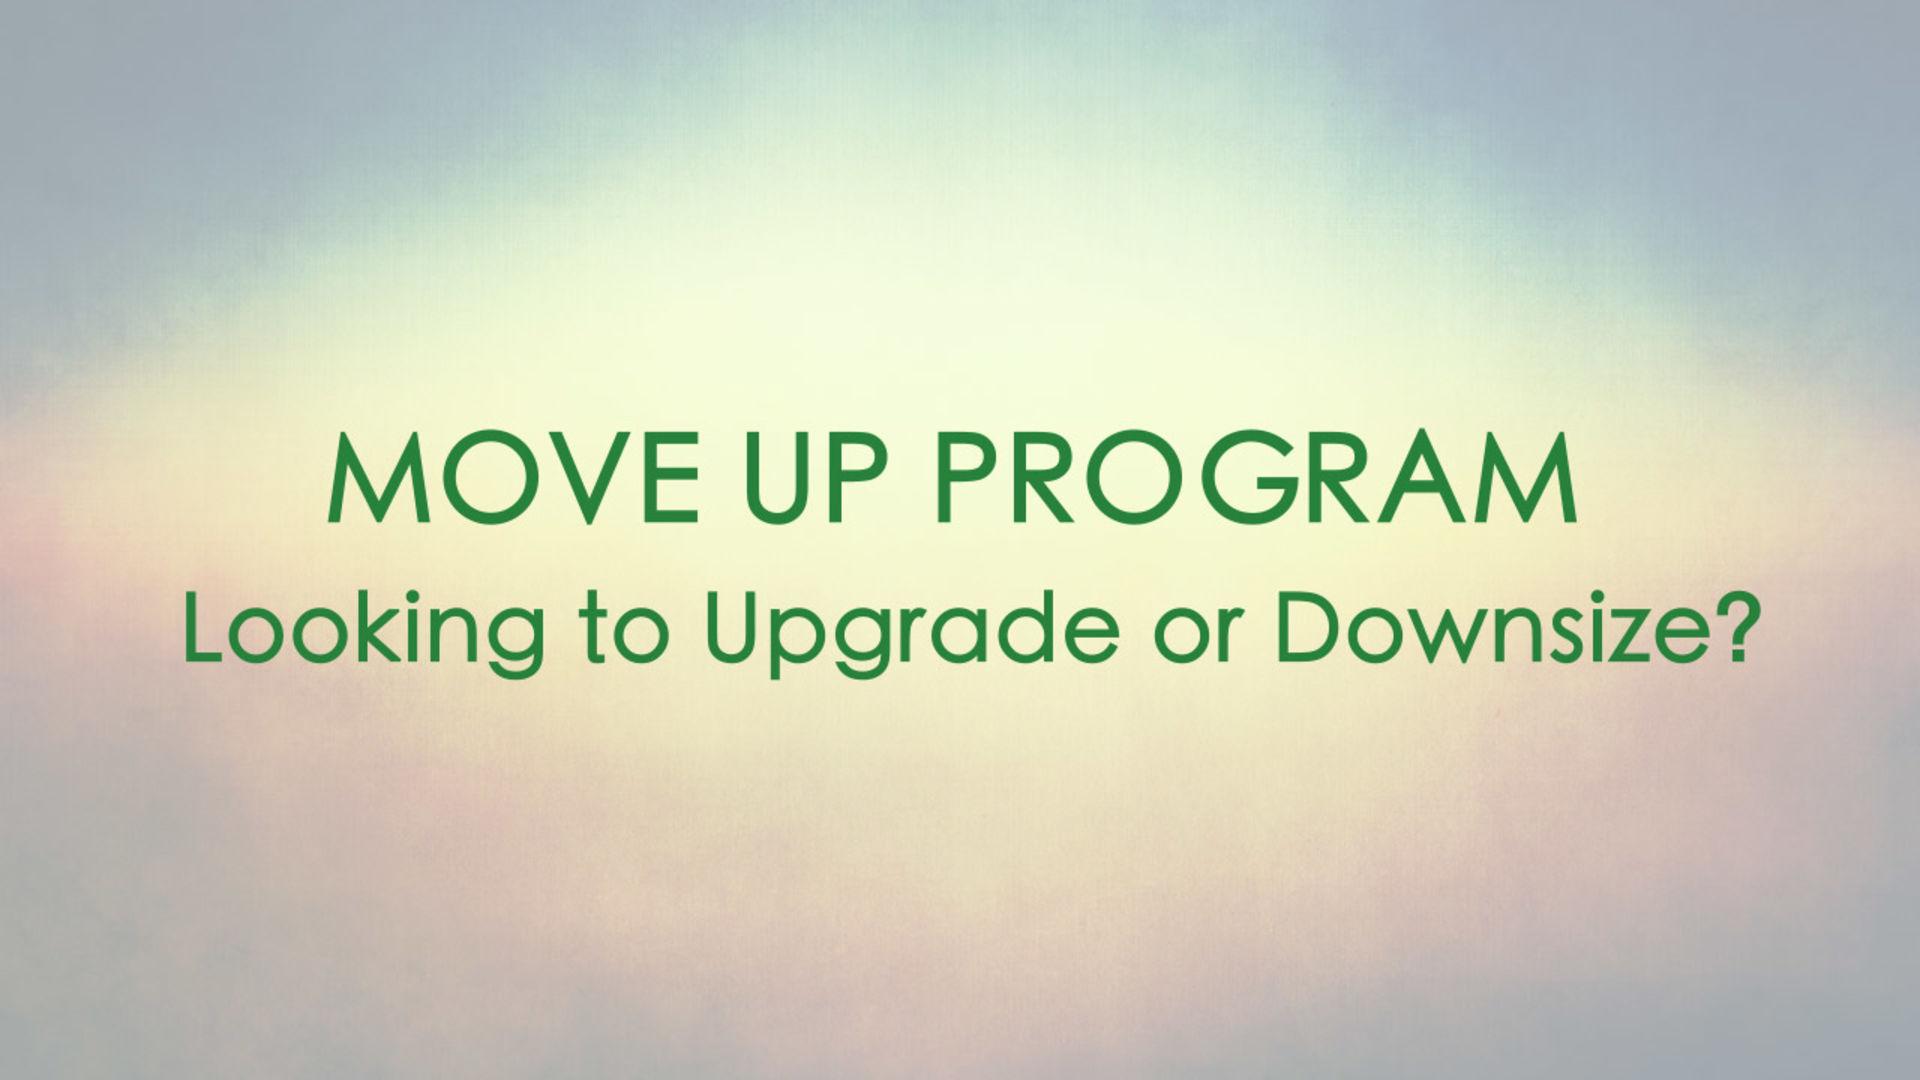 Move up Program